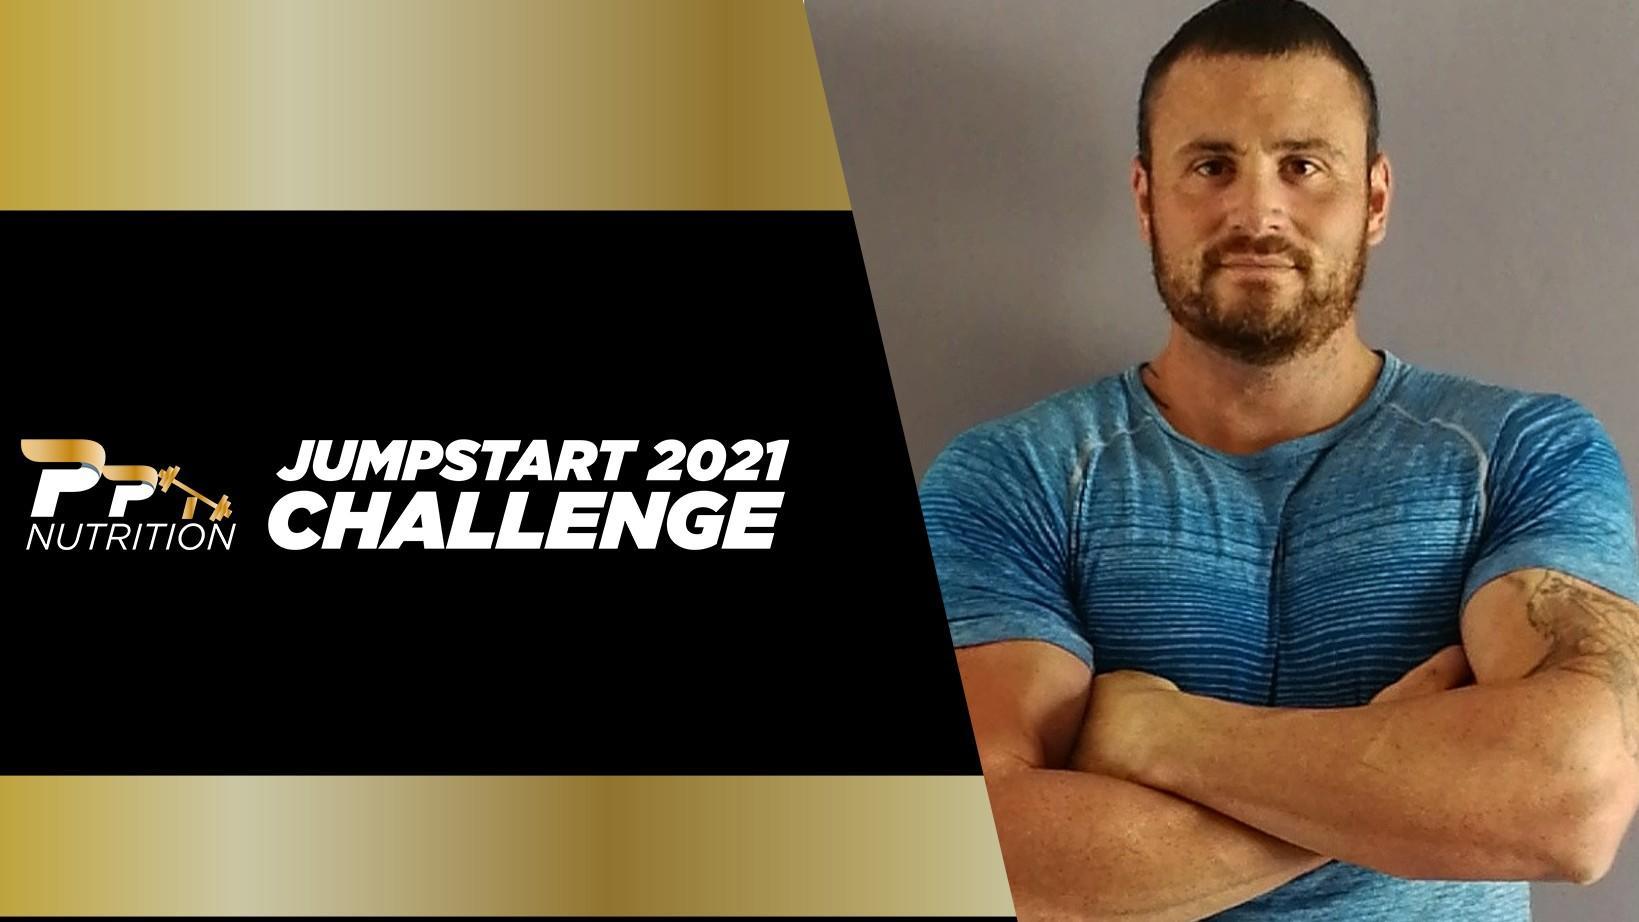 Jumpstart 2021 Challenge